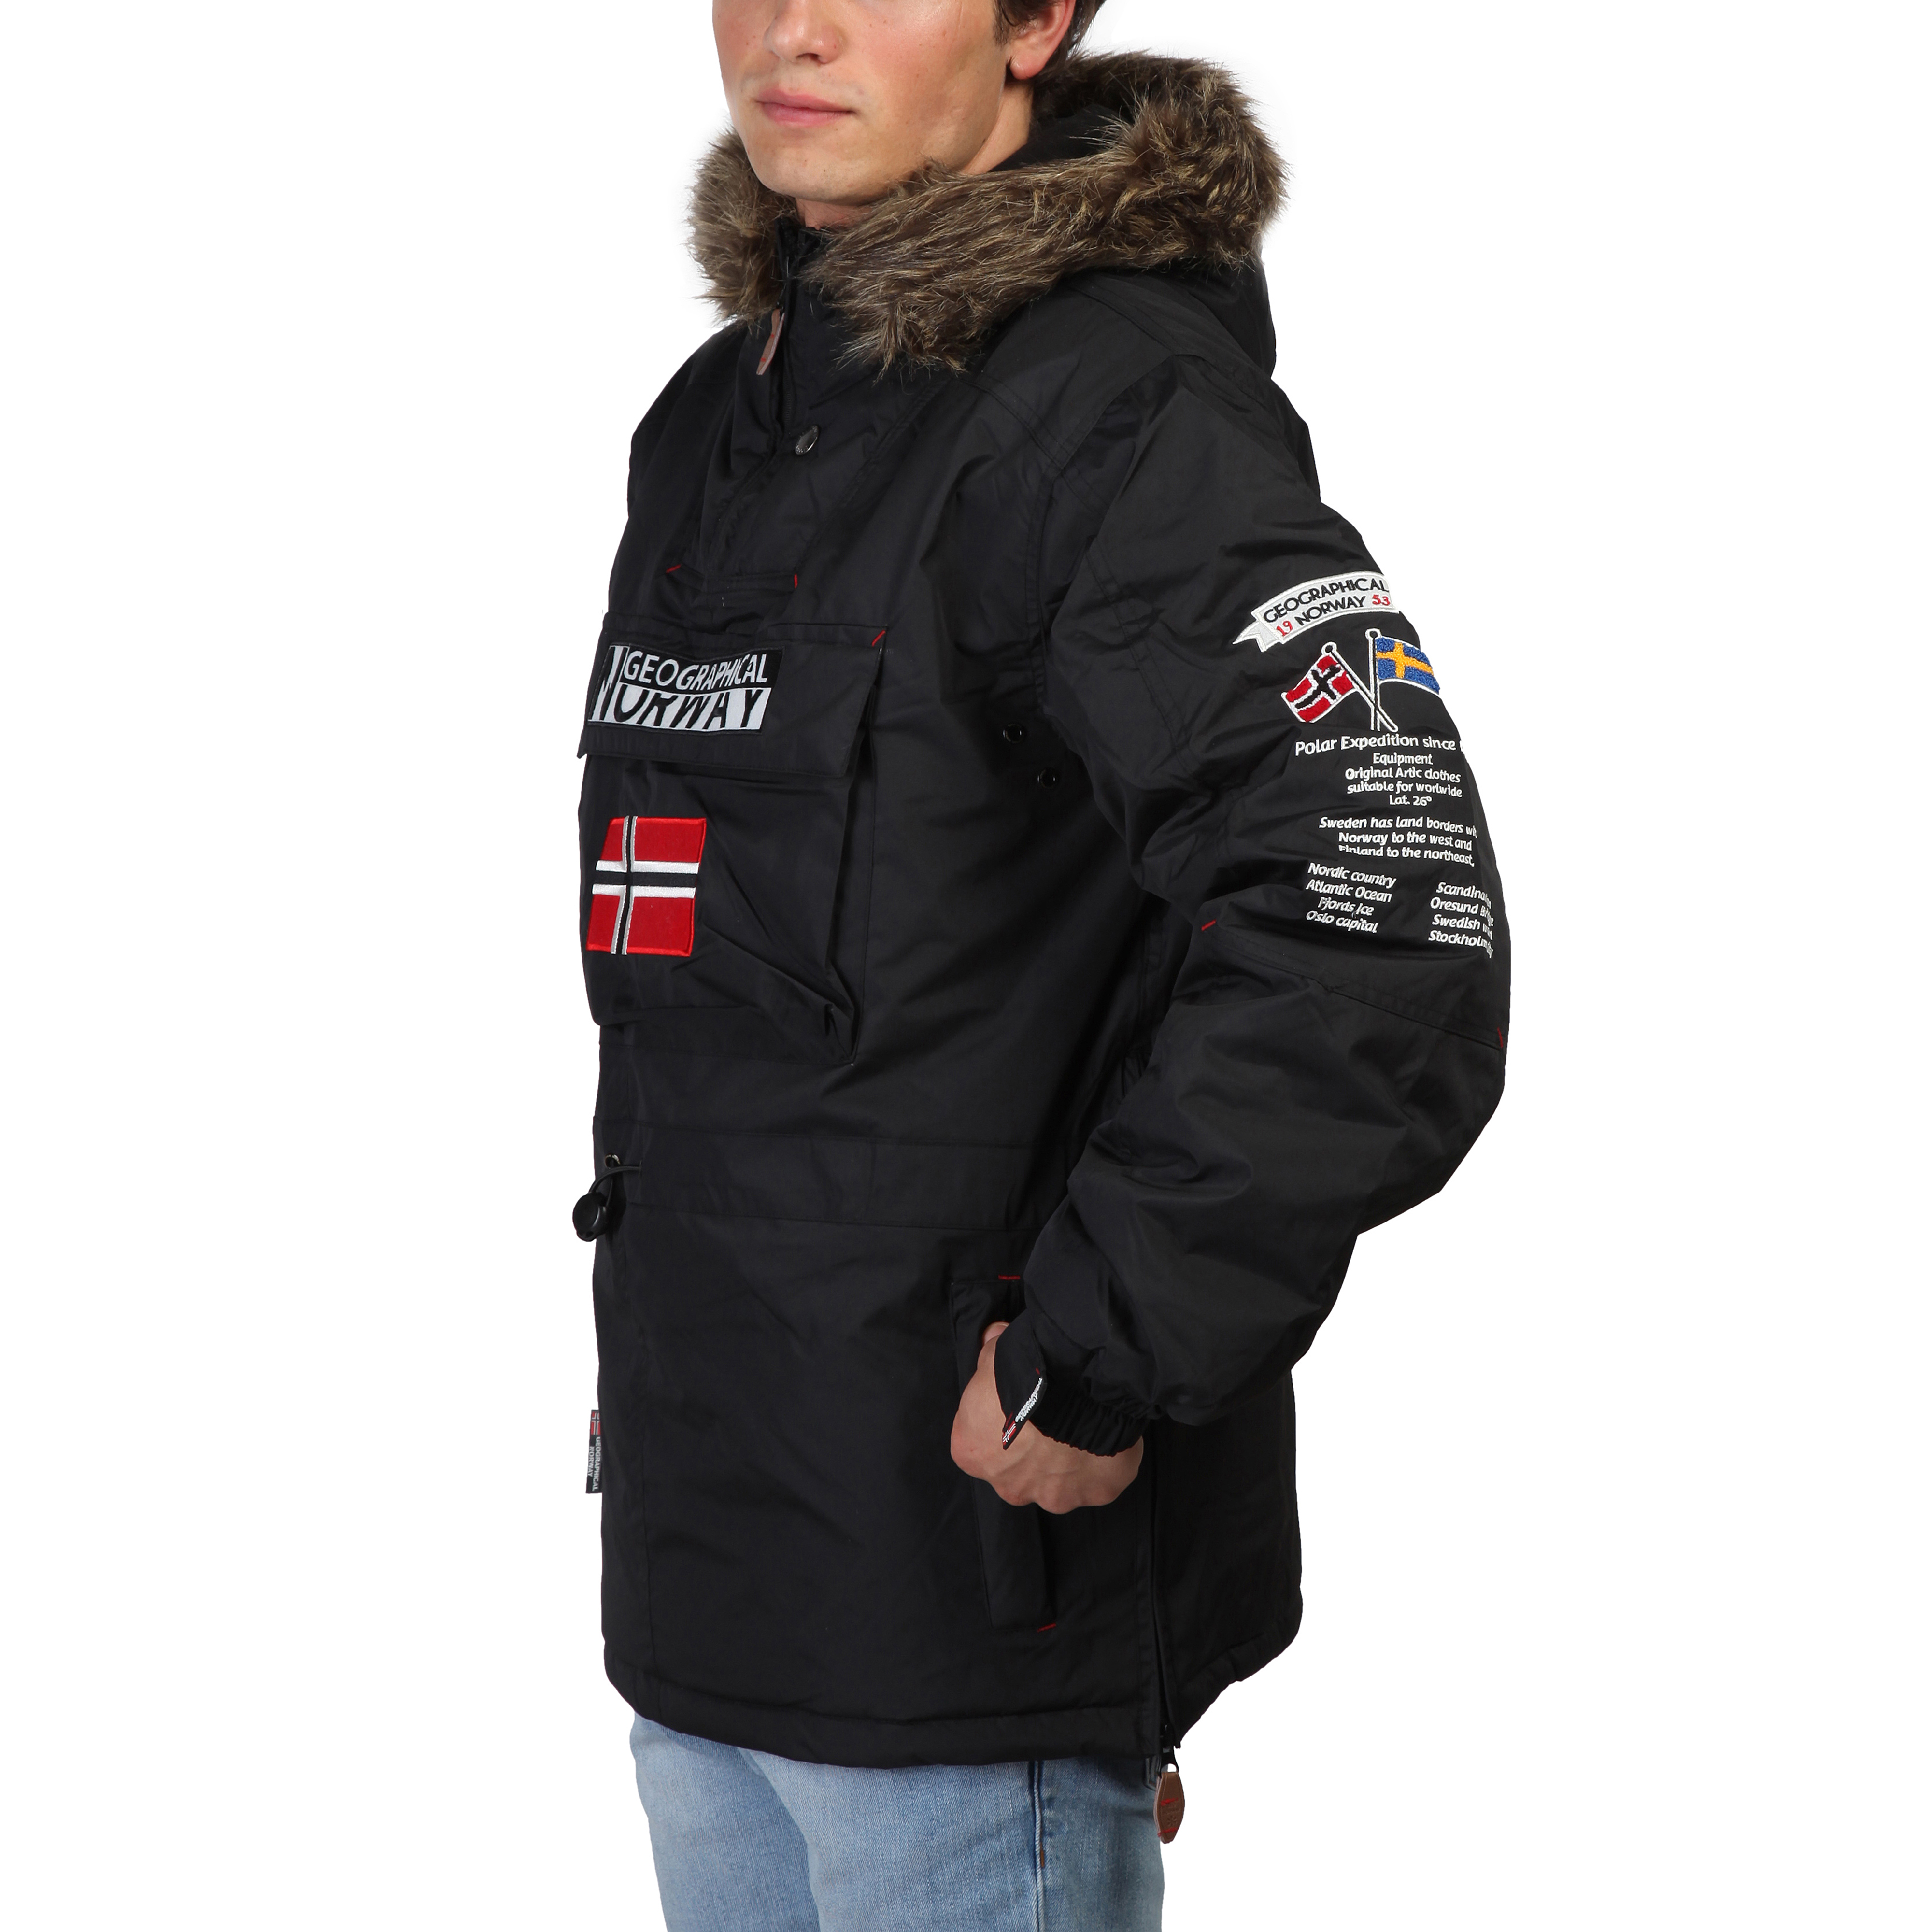 norway geographical jakke